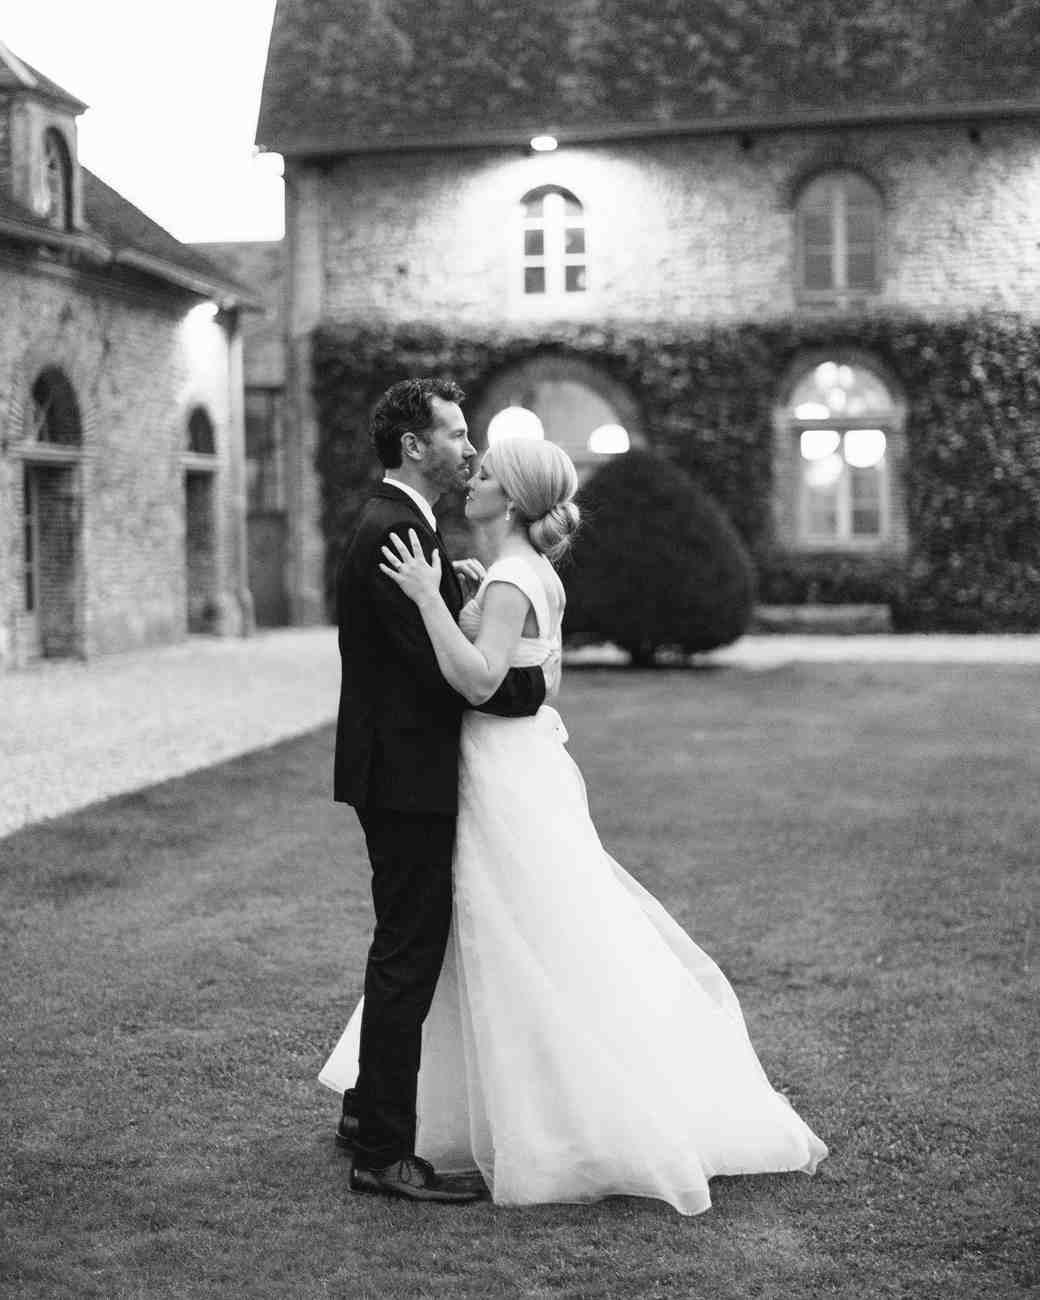 anneclaire-chris-wedding-france-firstdance-072-s113034-00716.jpg